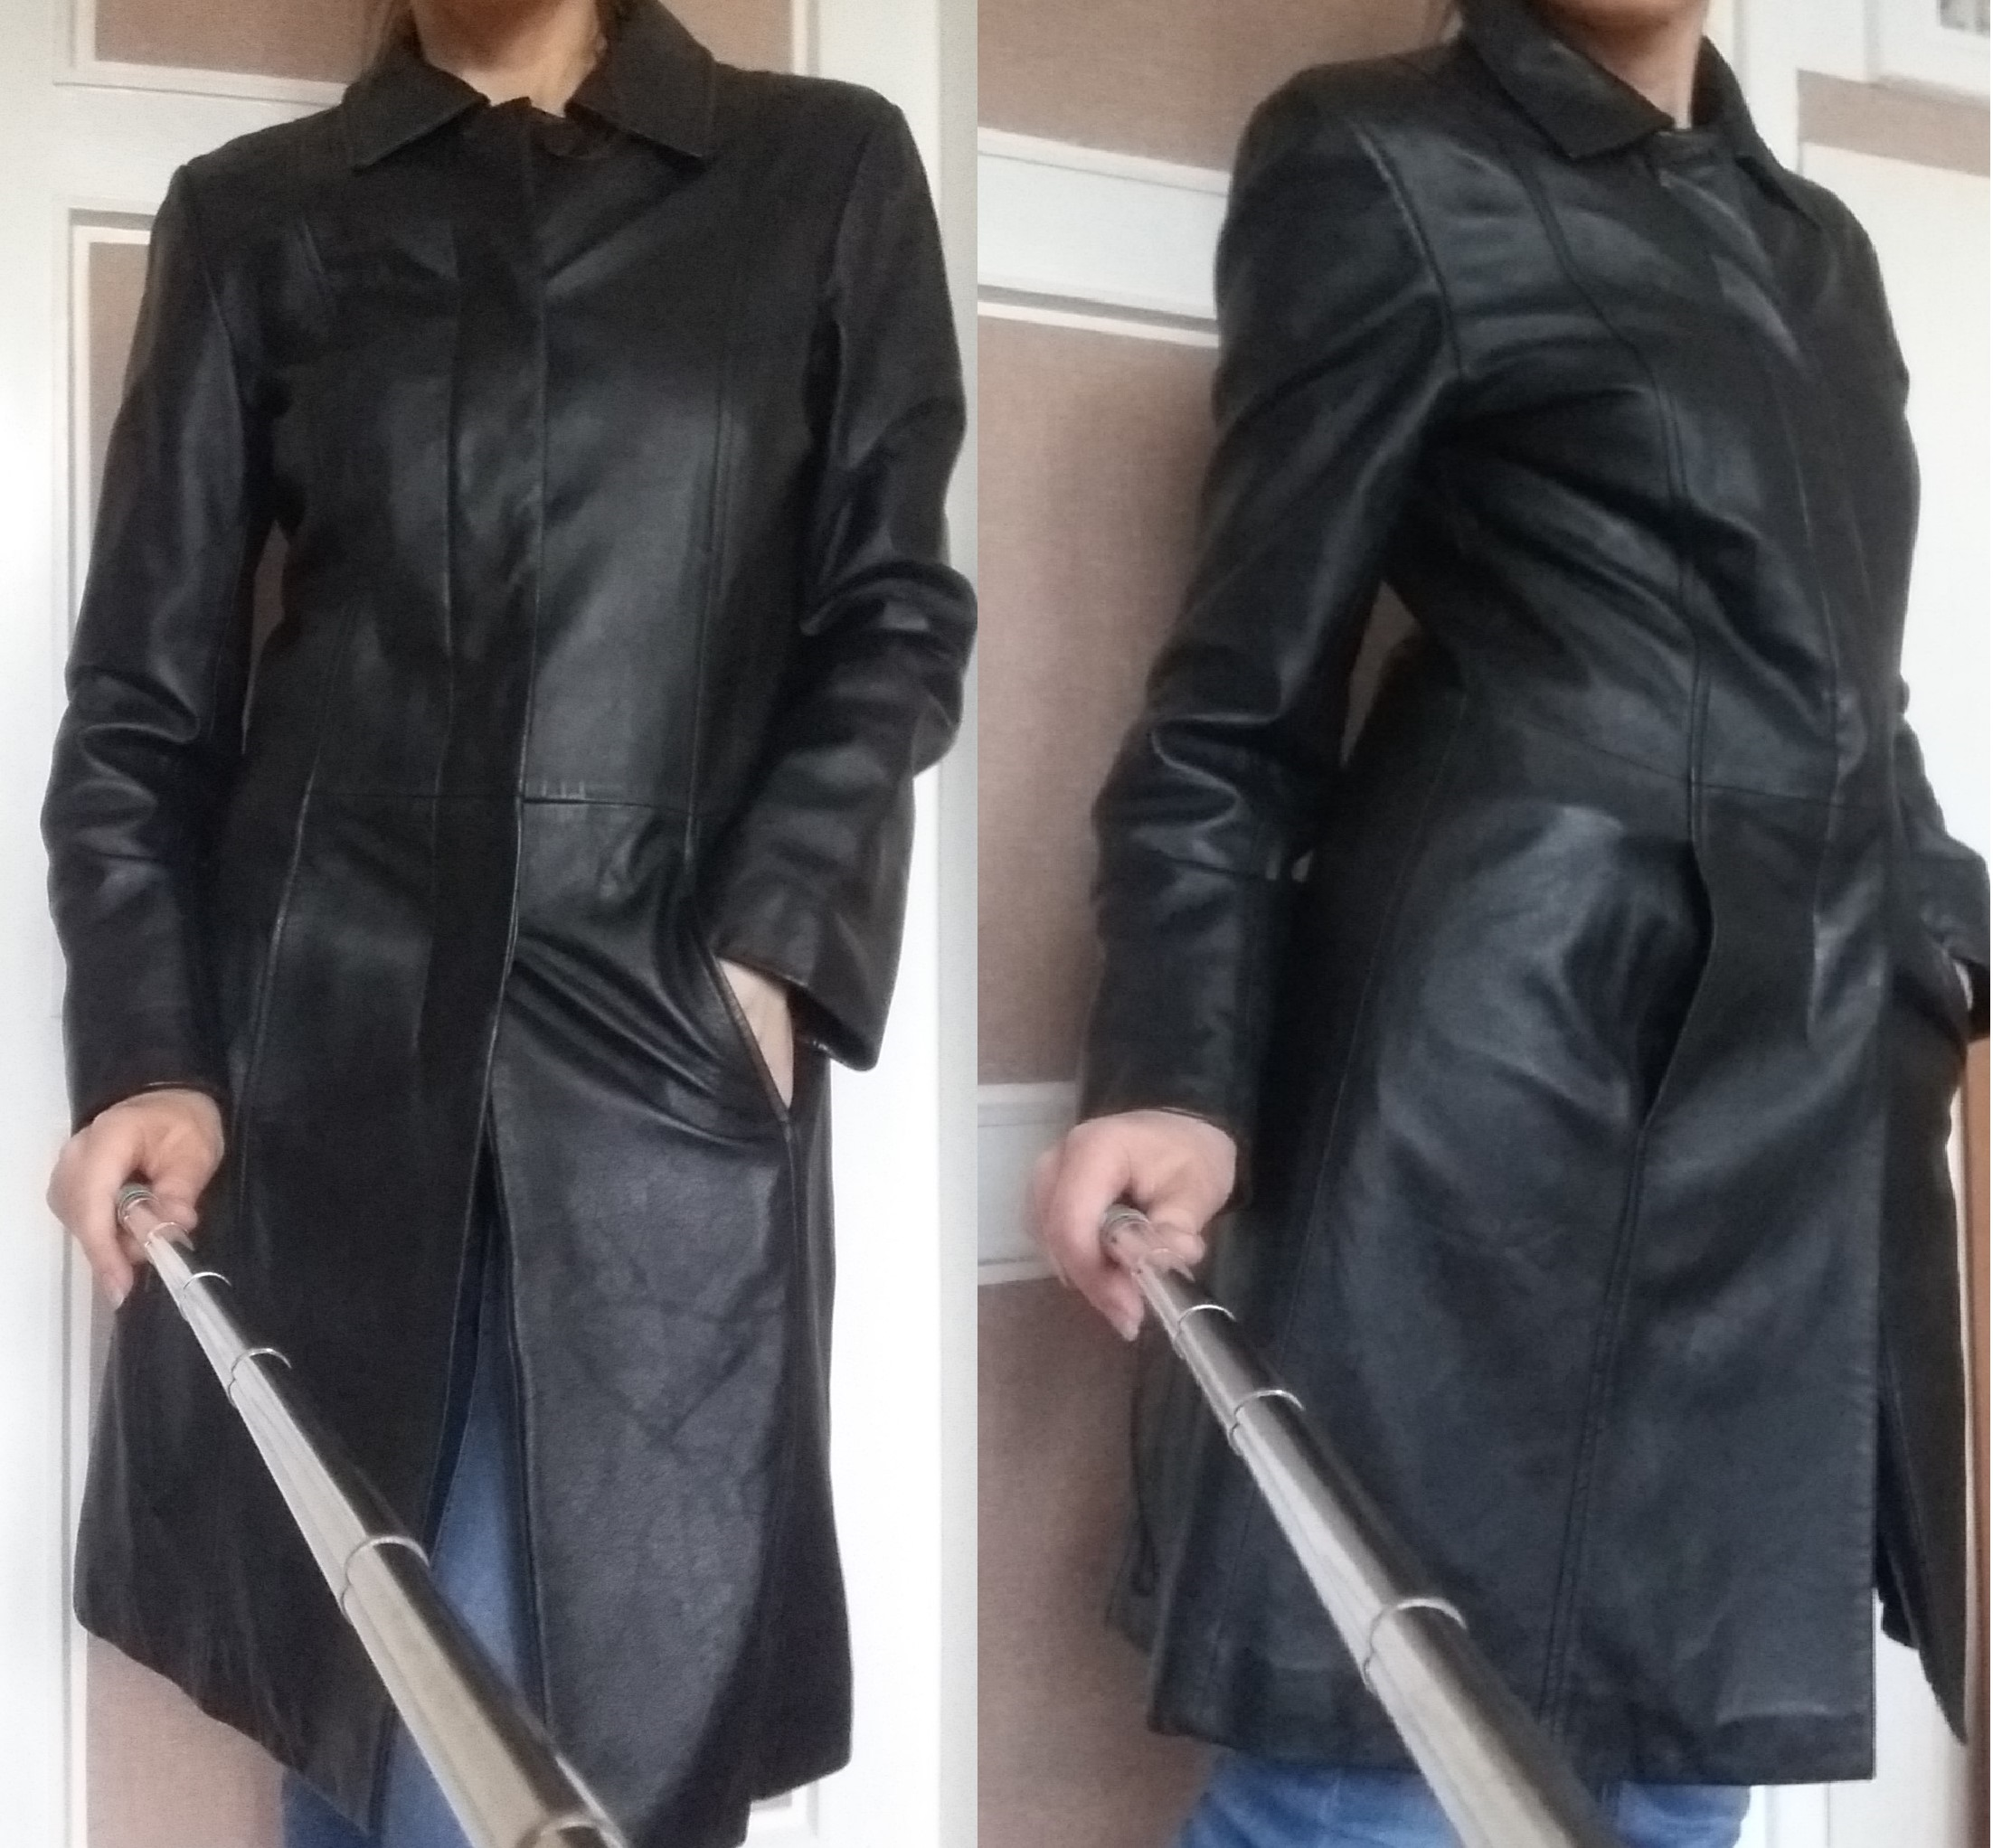 241d2ff0e96ac Piękny dopasowany płaszcz ze skóry naturalnej XS-S - 7291156493 ...